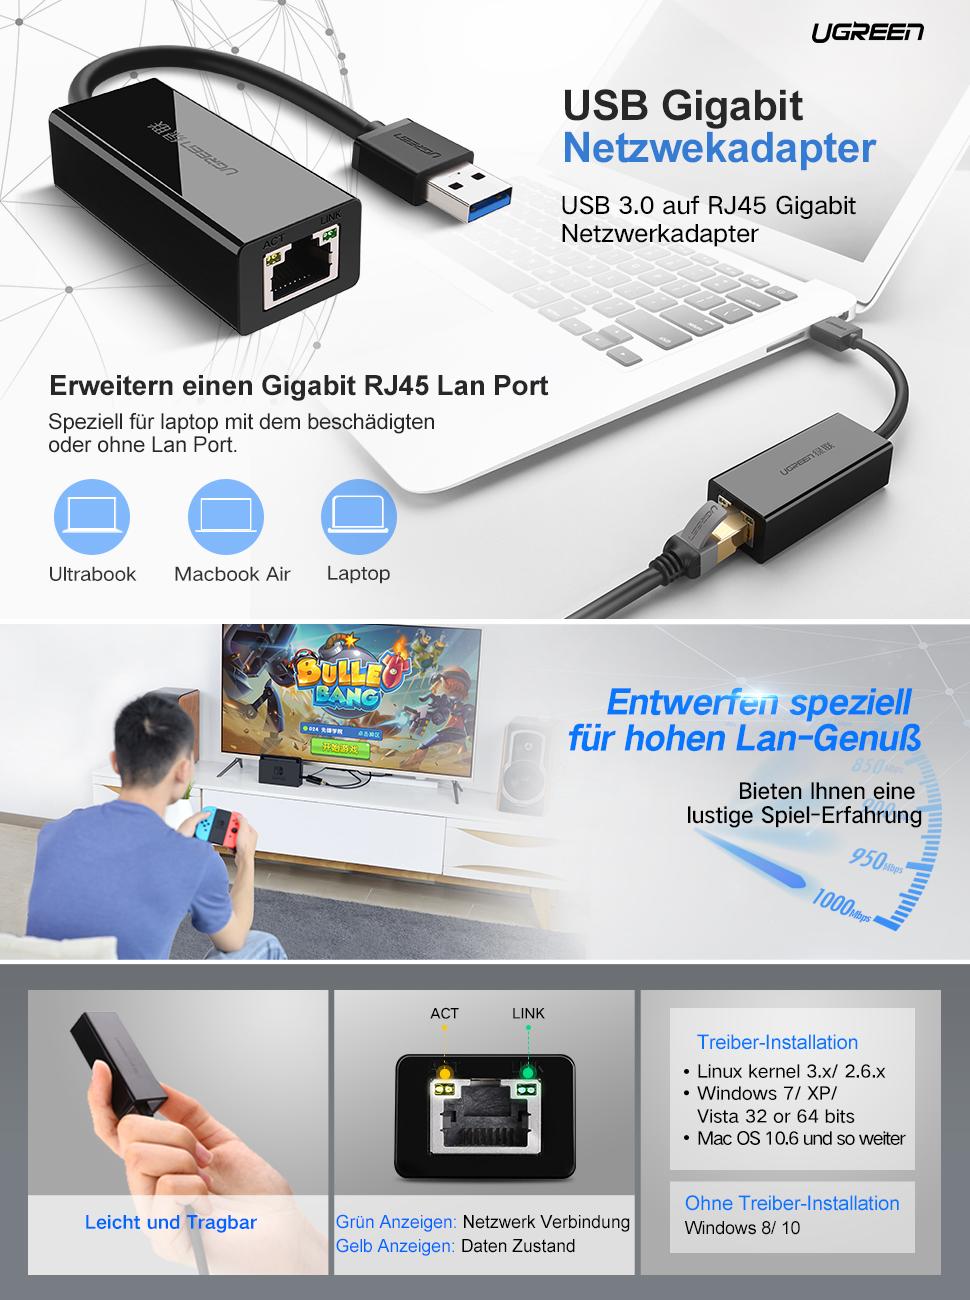 UGREEN 20256,USB Netzwerk Adapter, USB 3.0, 10: Amazon.de ...